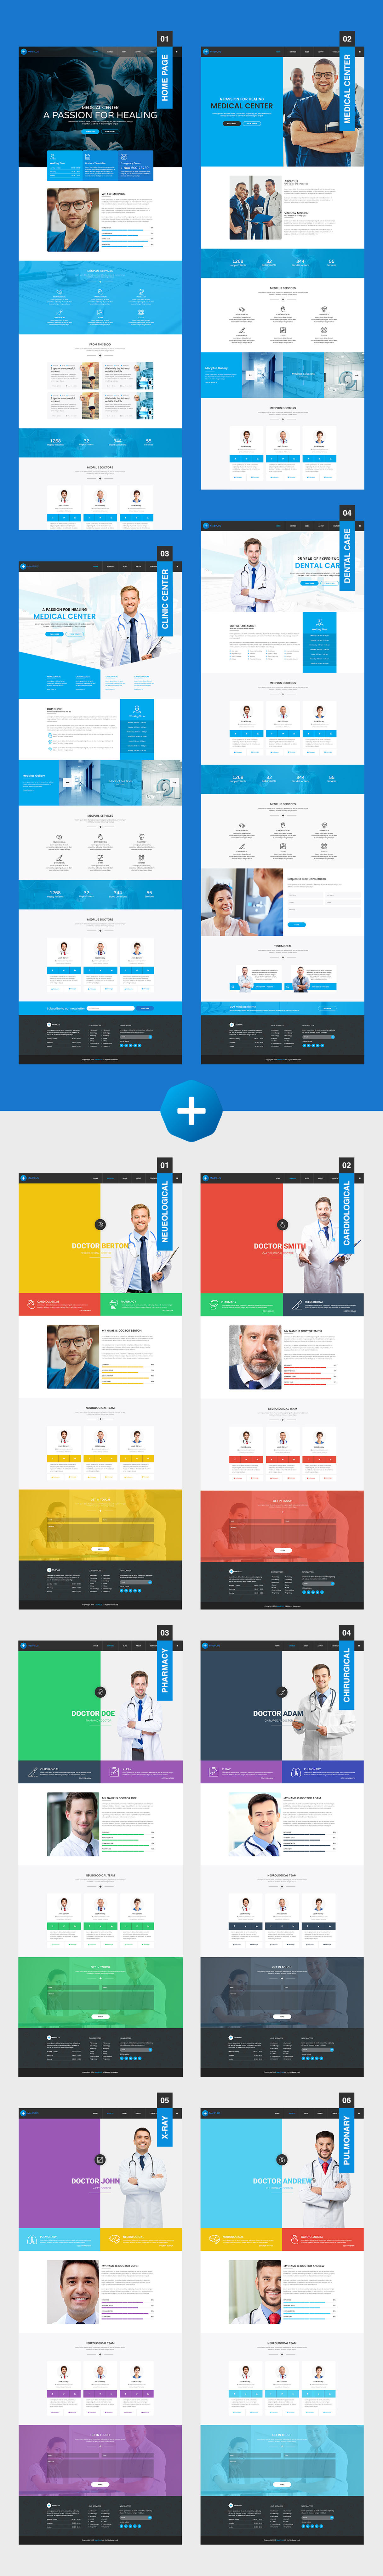 MedPlus – Medical & Health WordPress Theme - 3